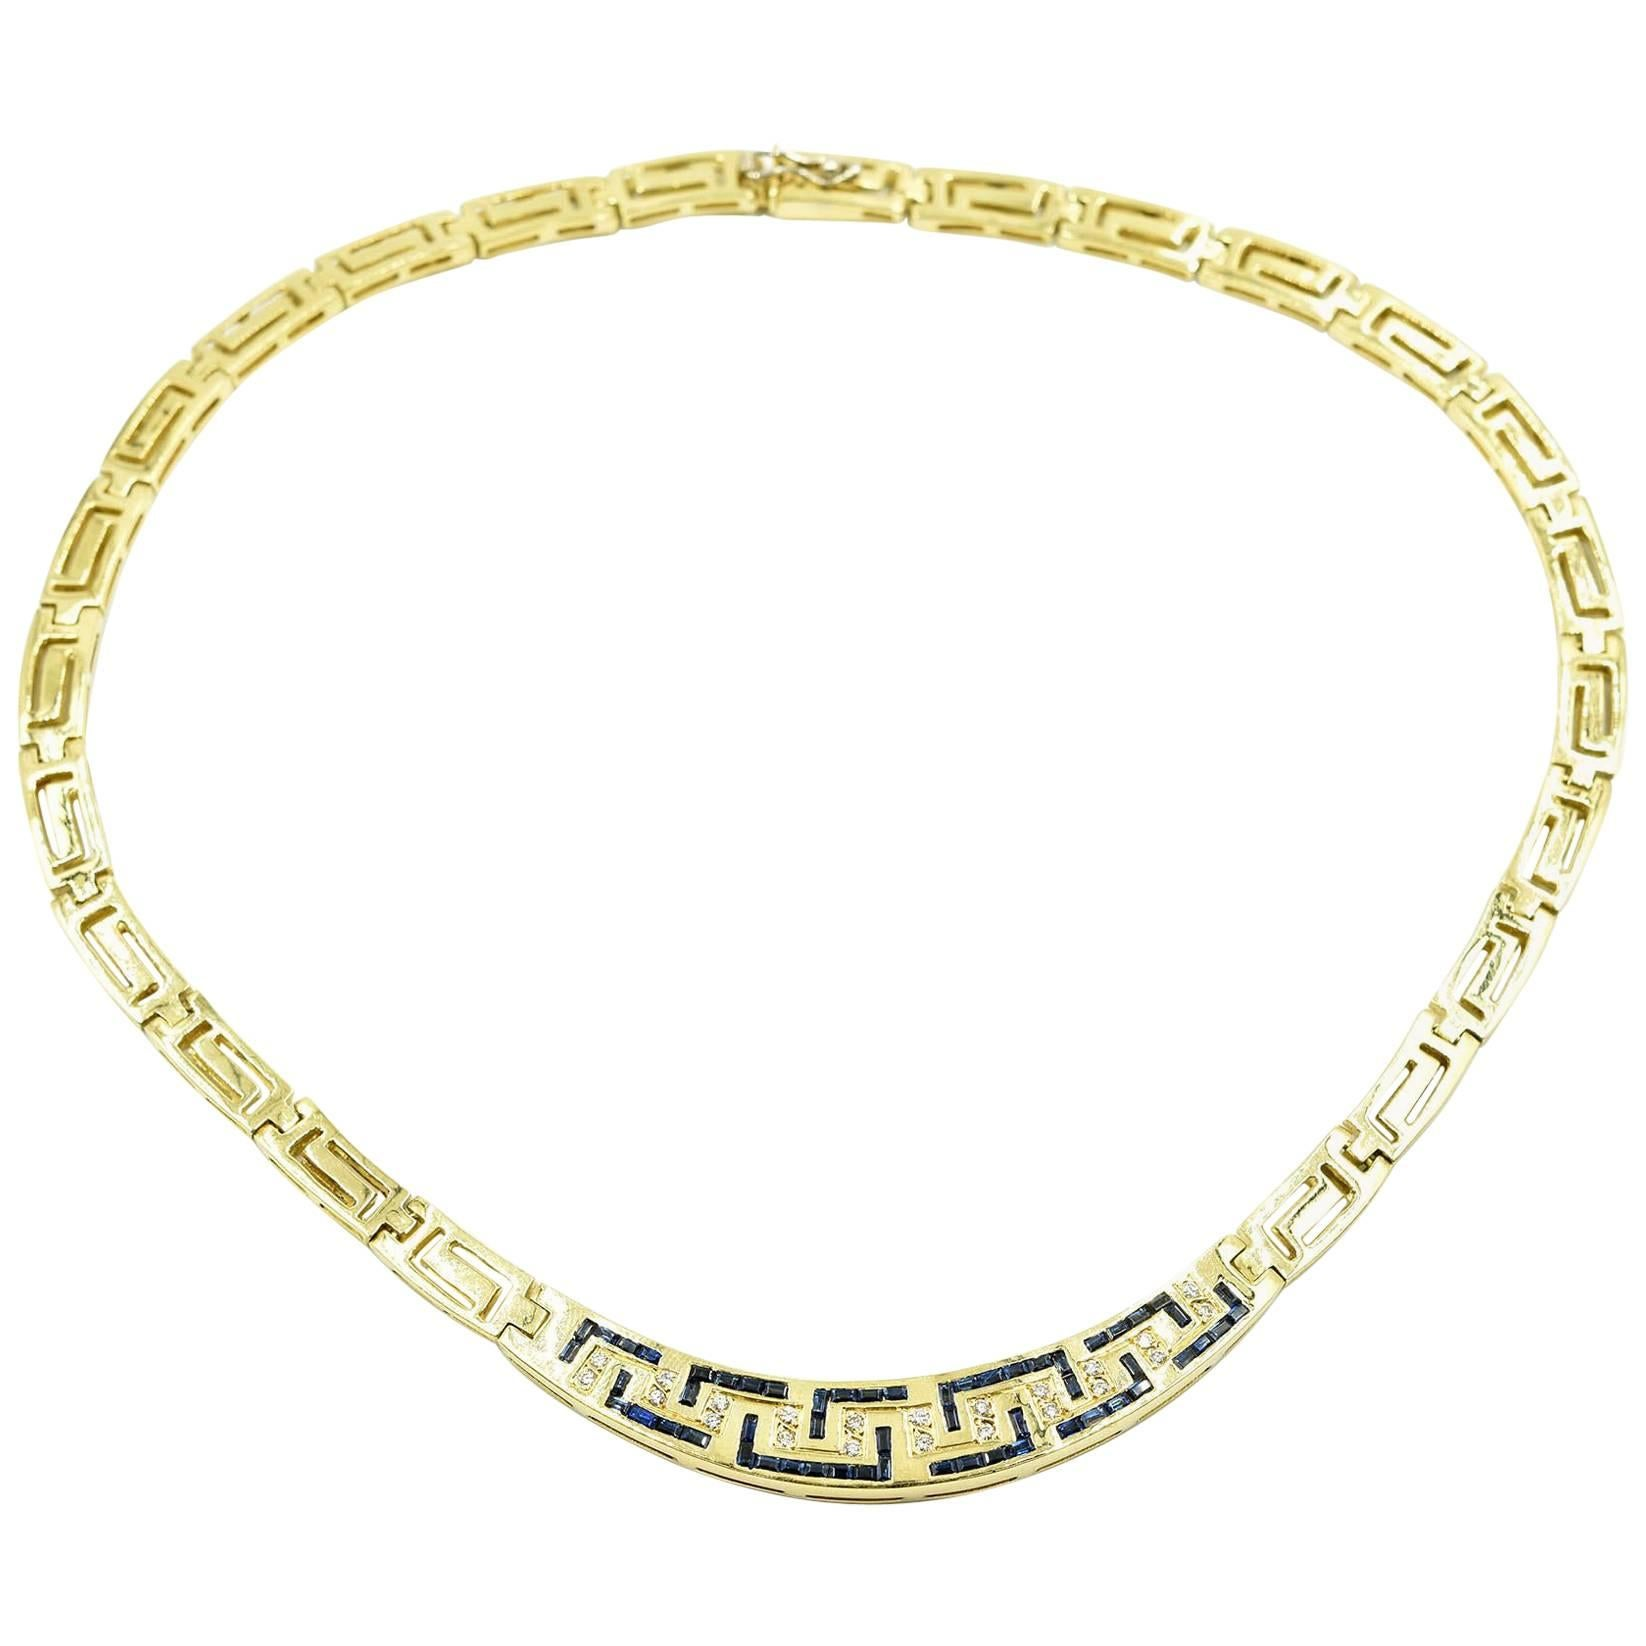 18k Yellow Gold, Diamond and Sapphire Greek Key Collar Necklace